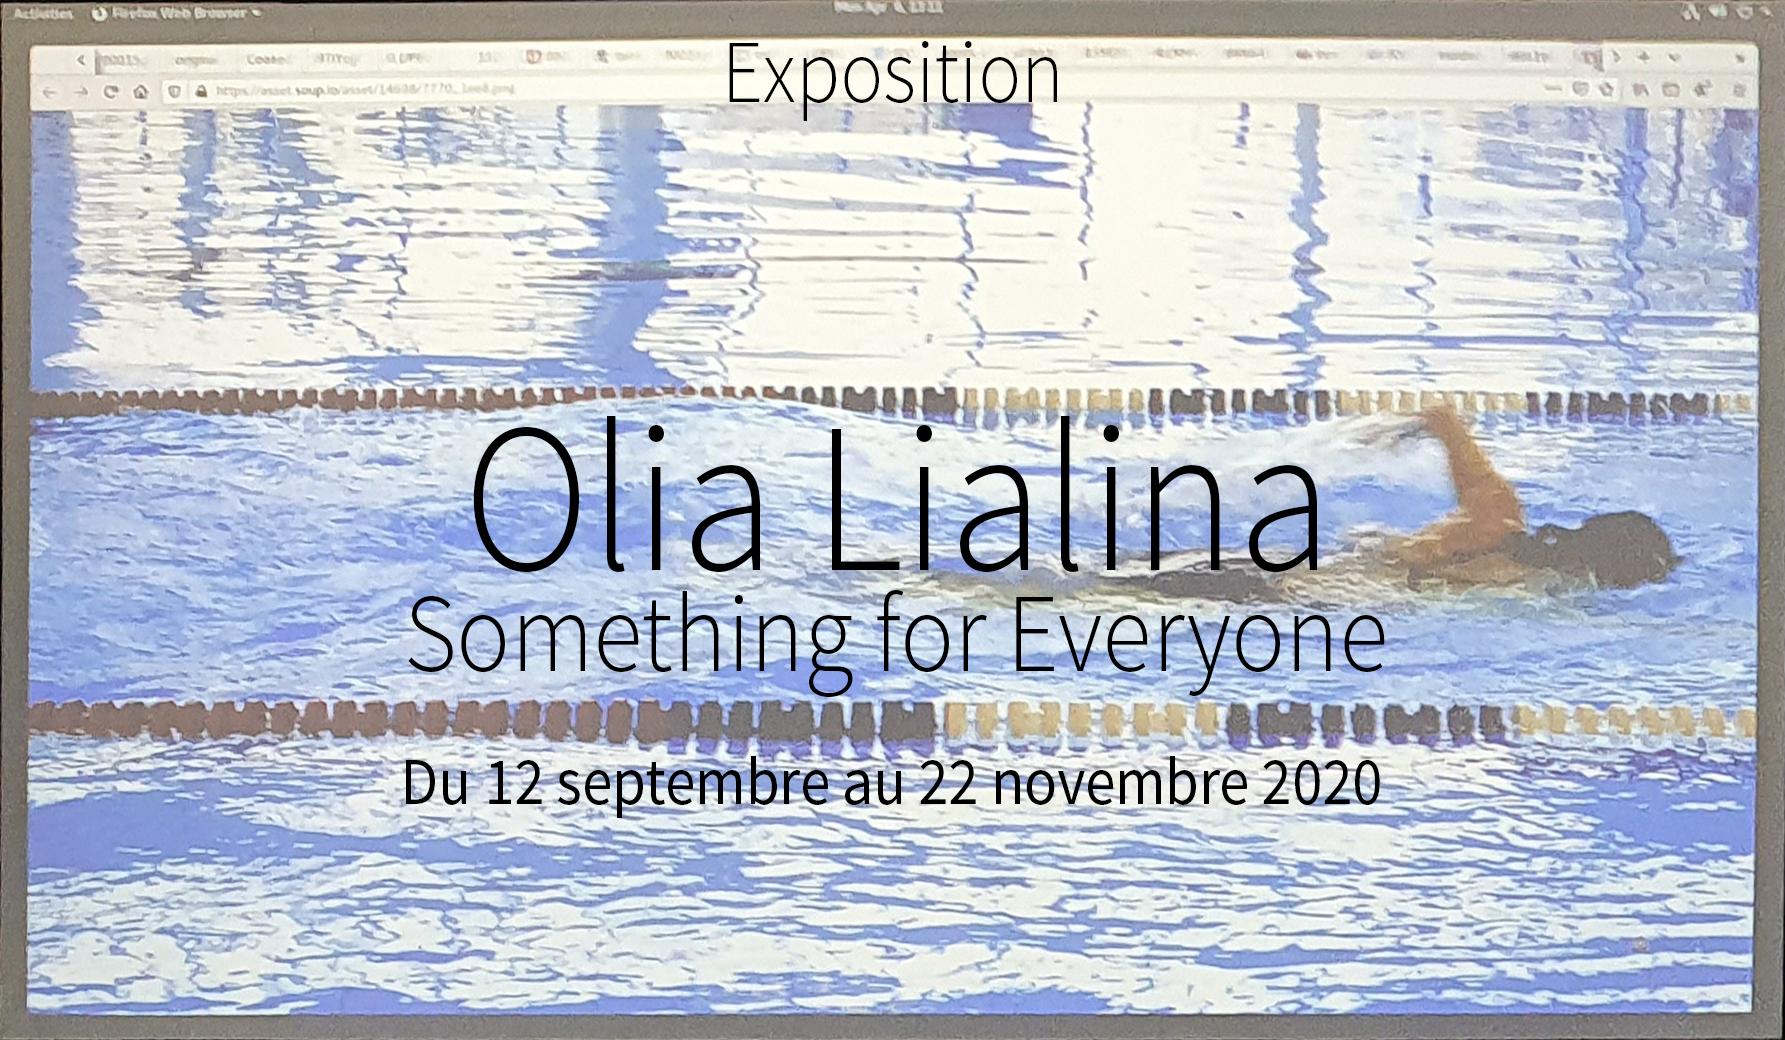 OliaLialina_visuDiapoEMG